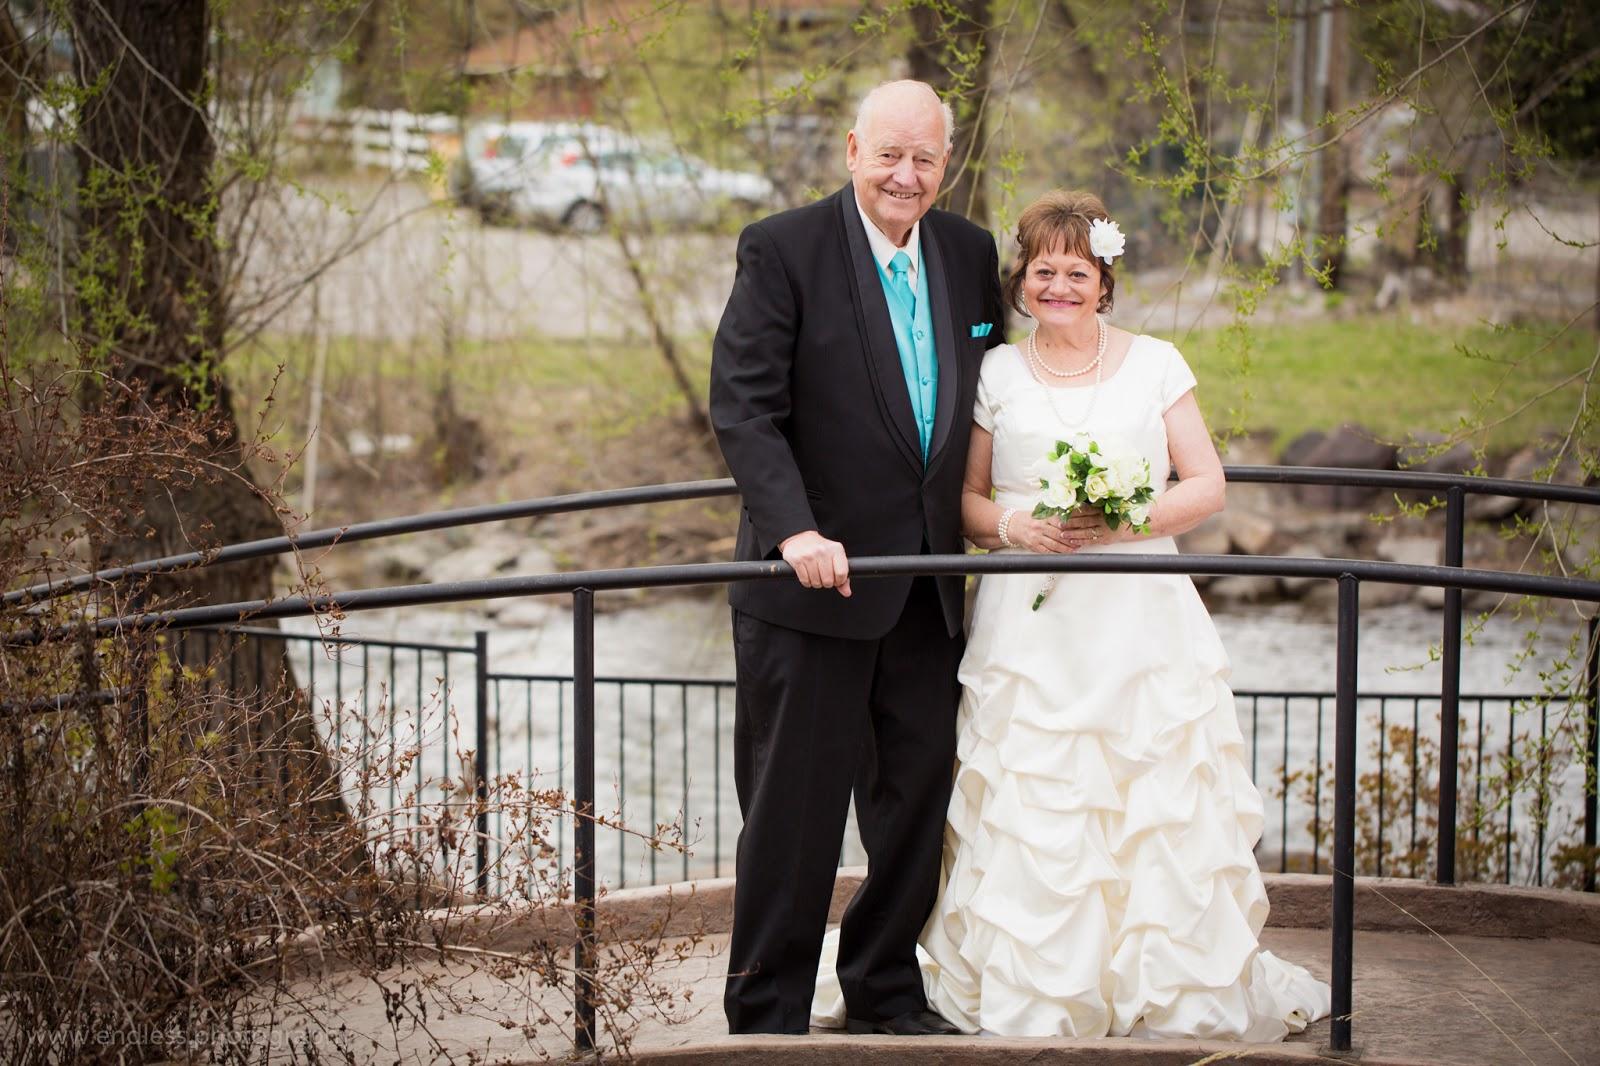 Logan Utah Wedding Photographers, Weddings, Utah, Logan, Photography, Photographers, Engagements